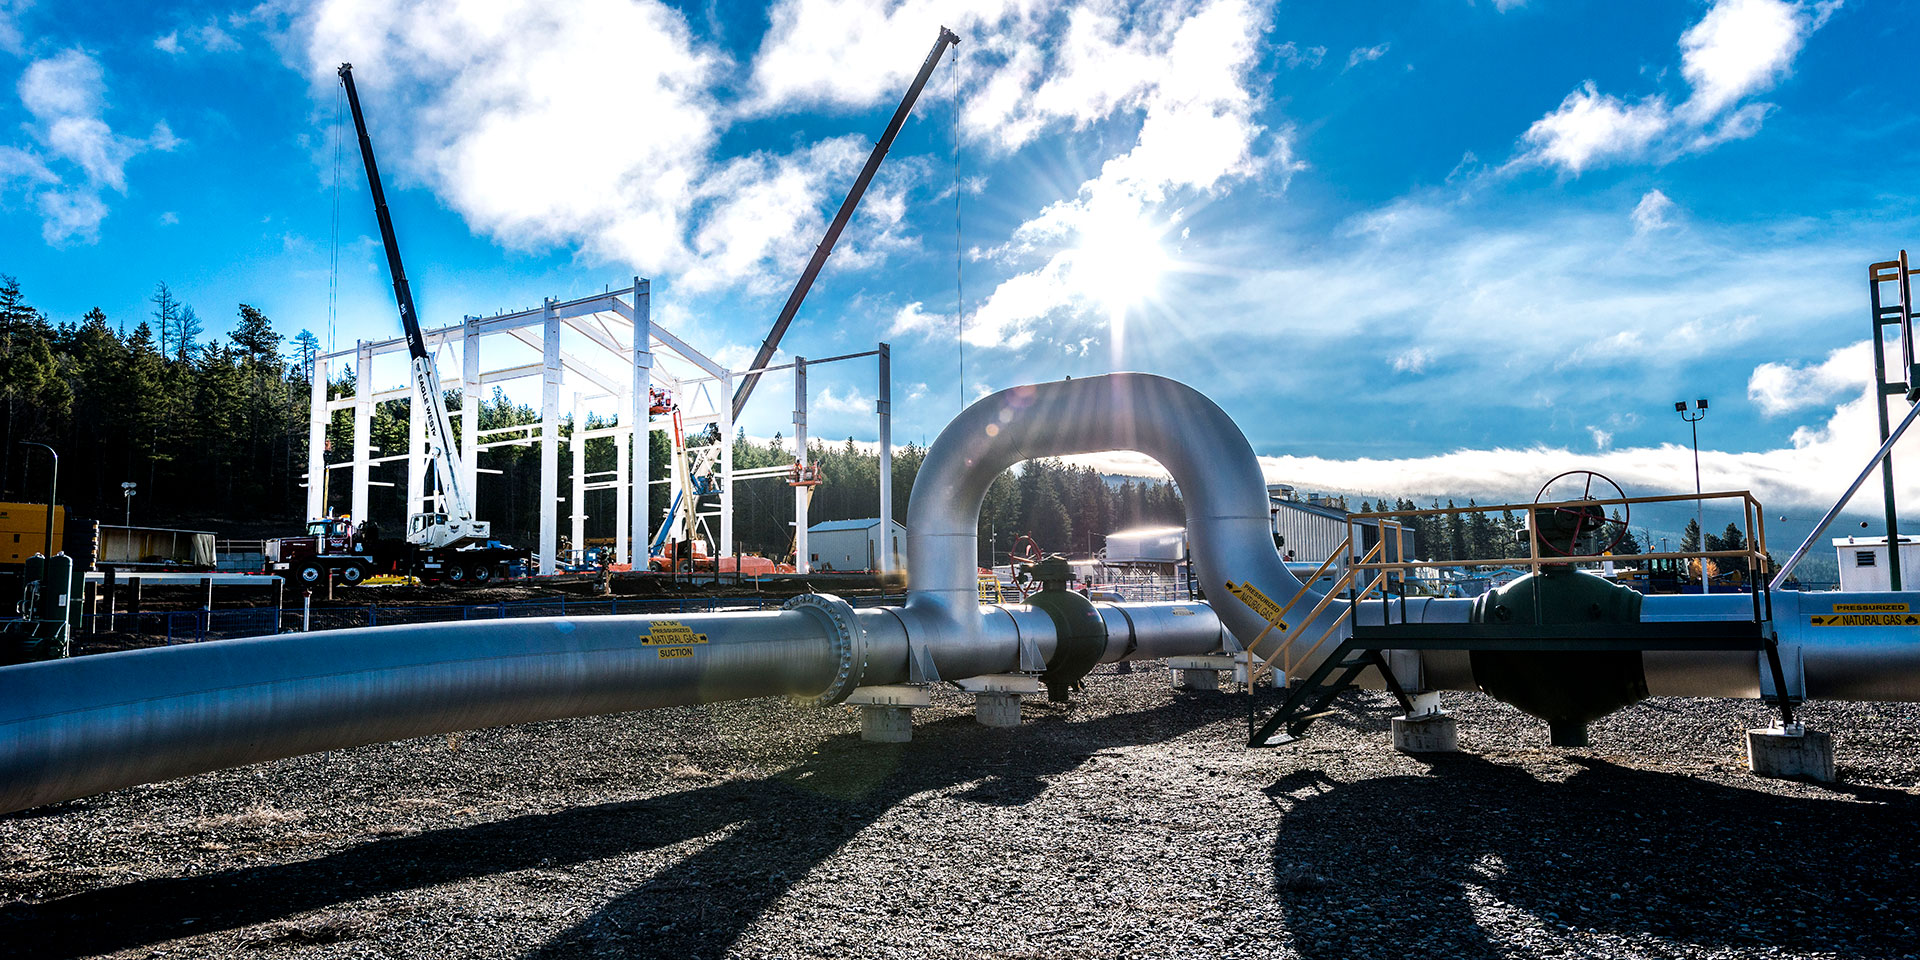 Spectra Energy Pipeline Facilities Exterior